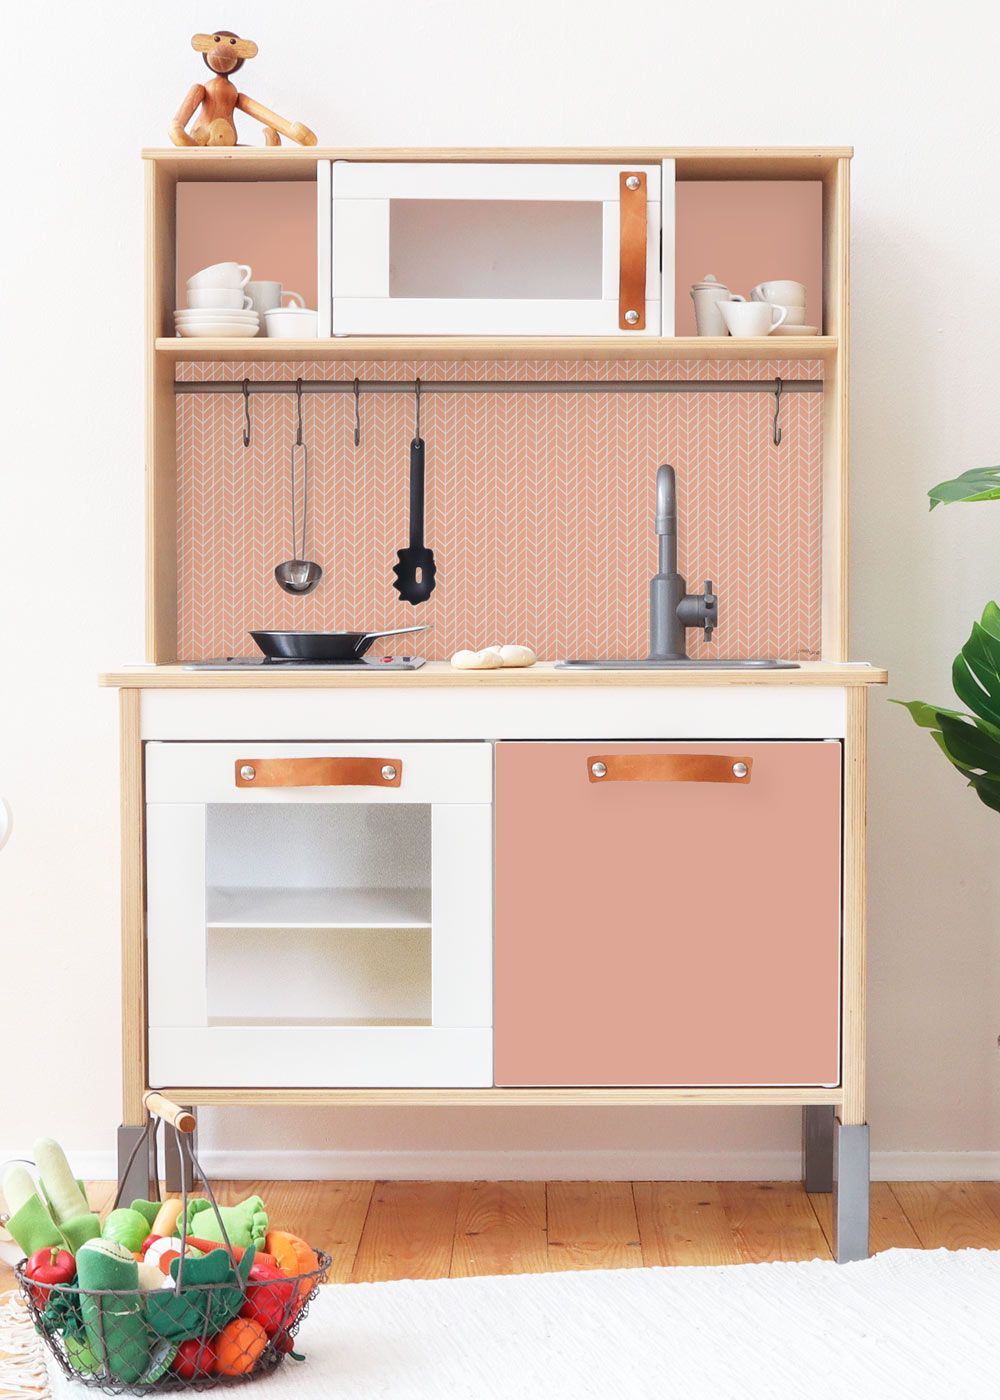 Ikea Duktig Kinderküche Rosig Rosa